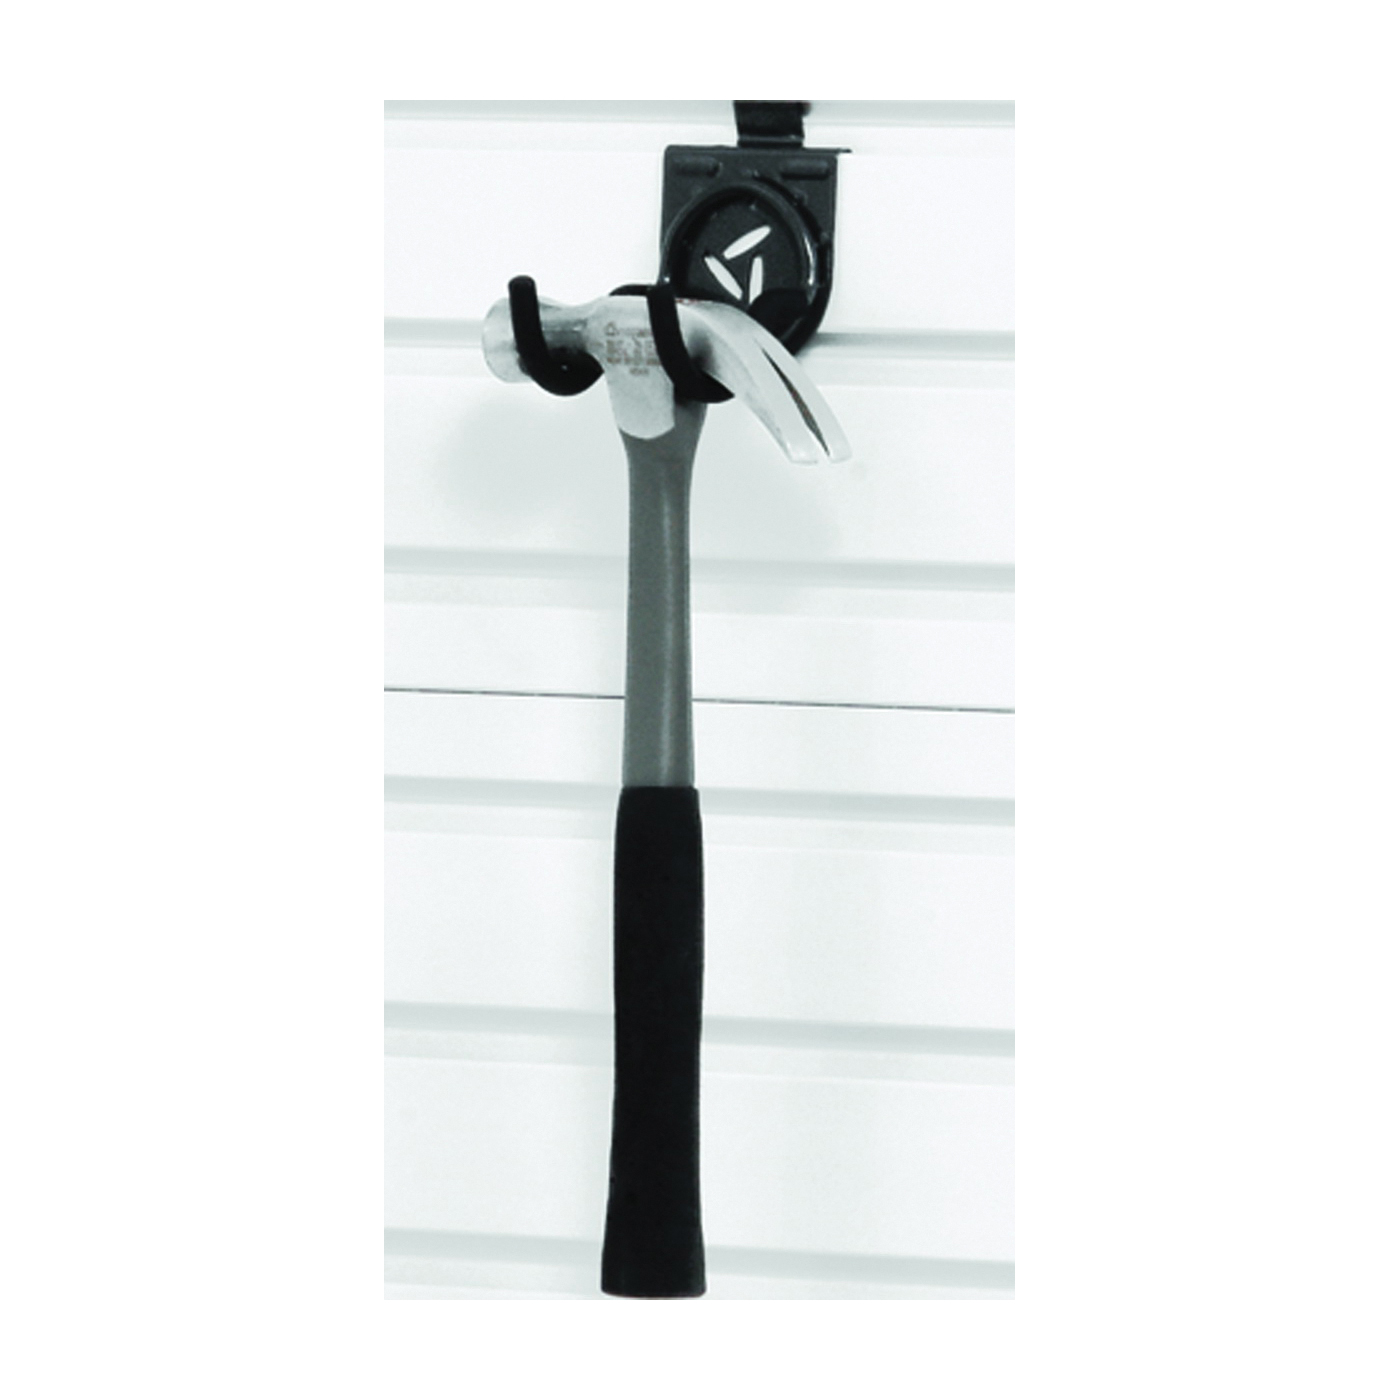 Picture of GLADIATOR GAWUXXSCRH Scoop Hook, 25 lb, Steel, Granite, Powder-Coated